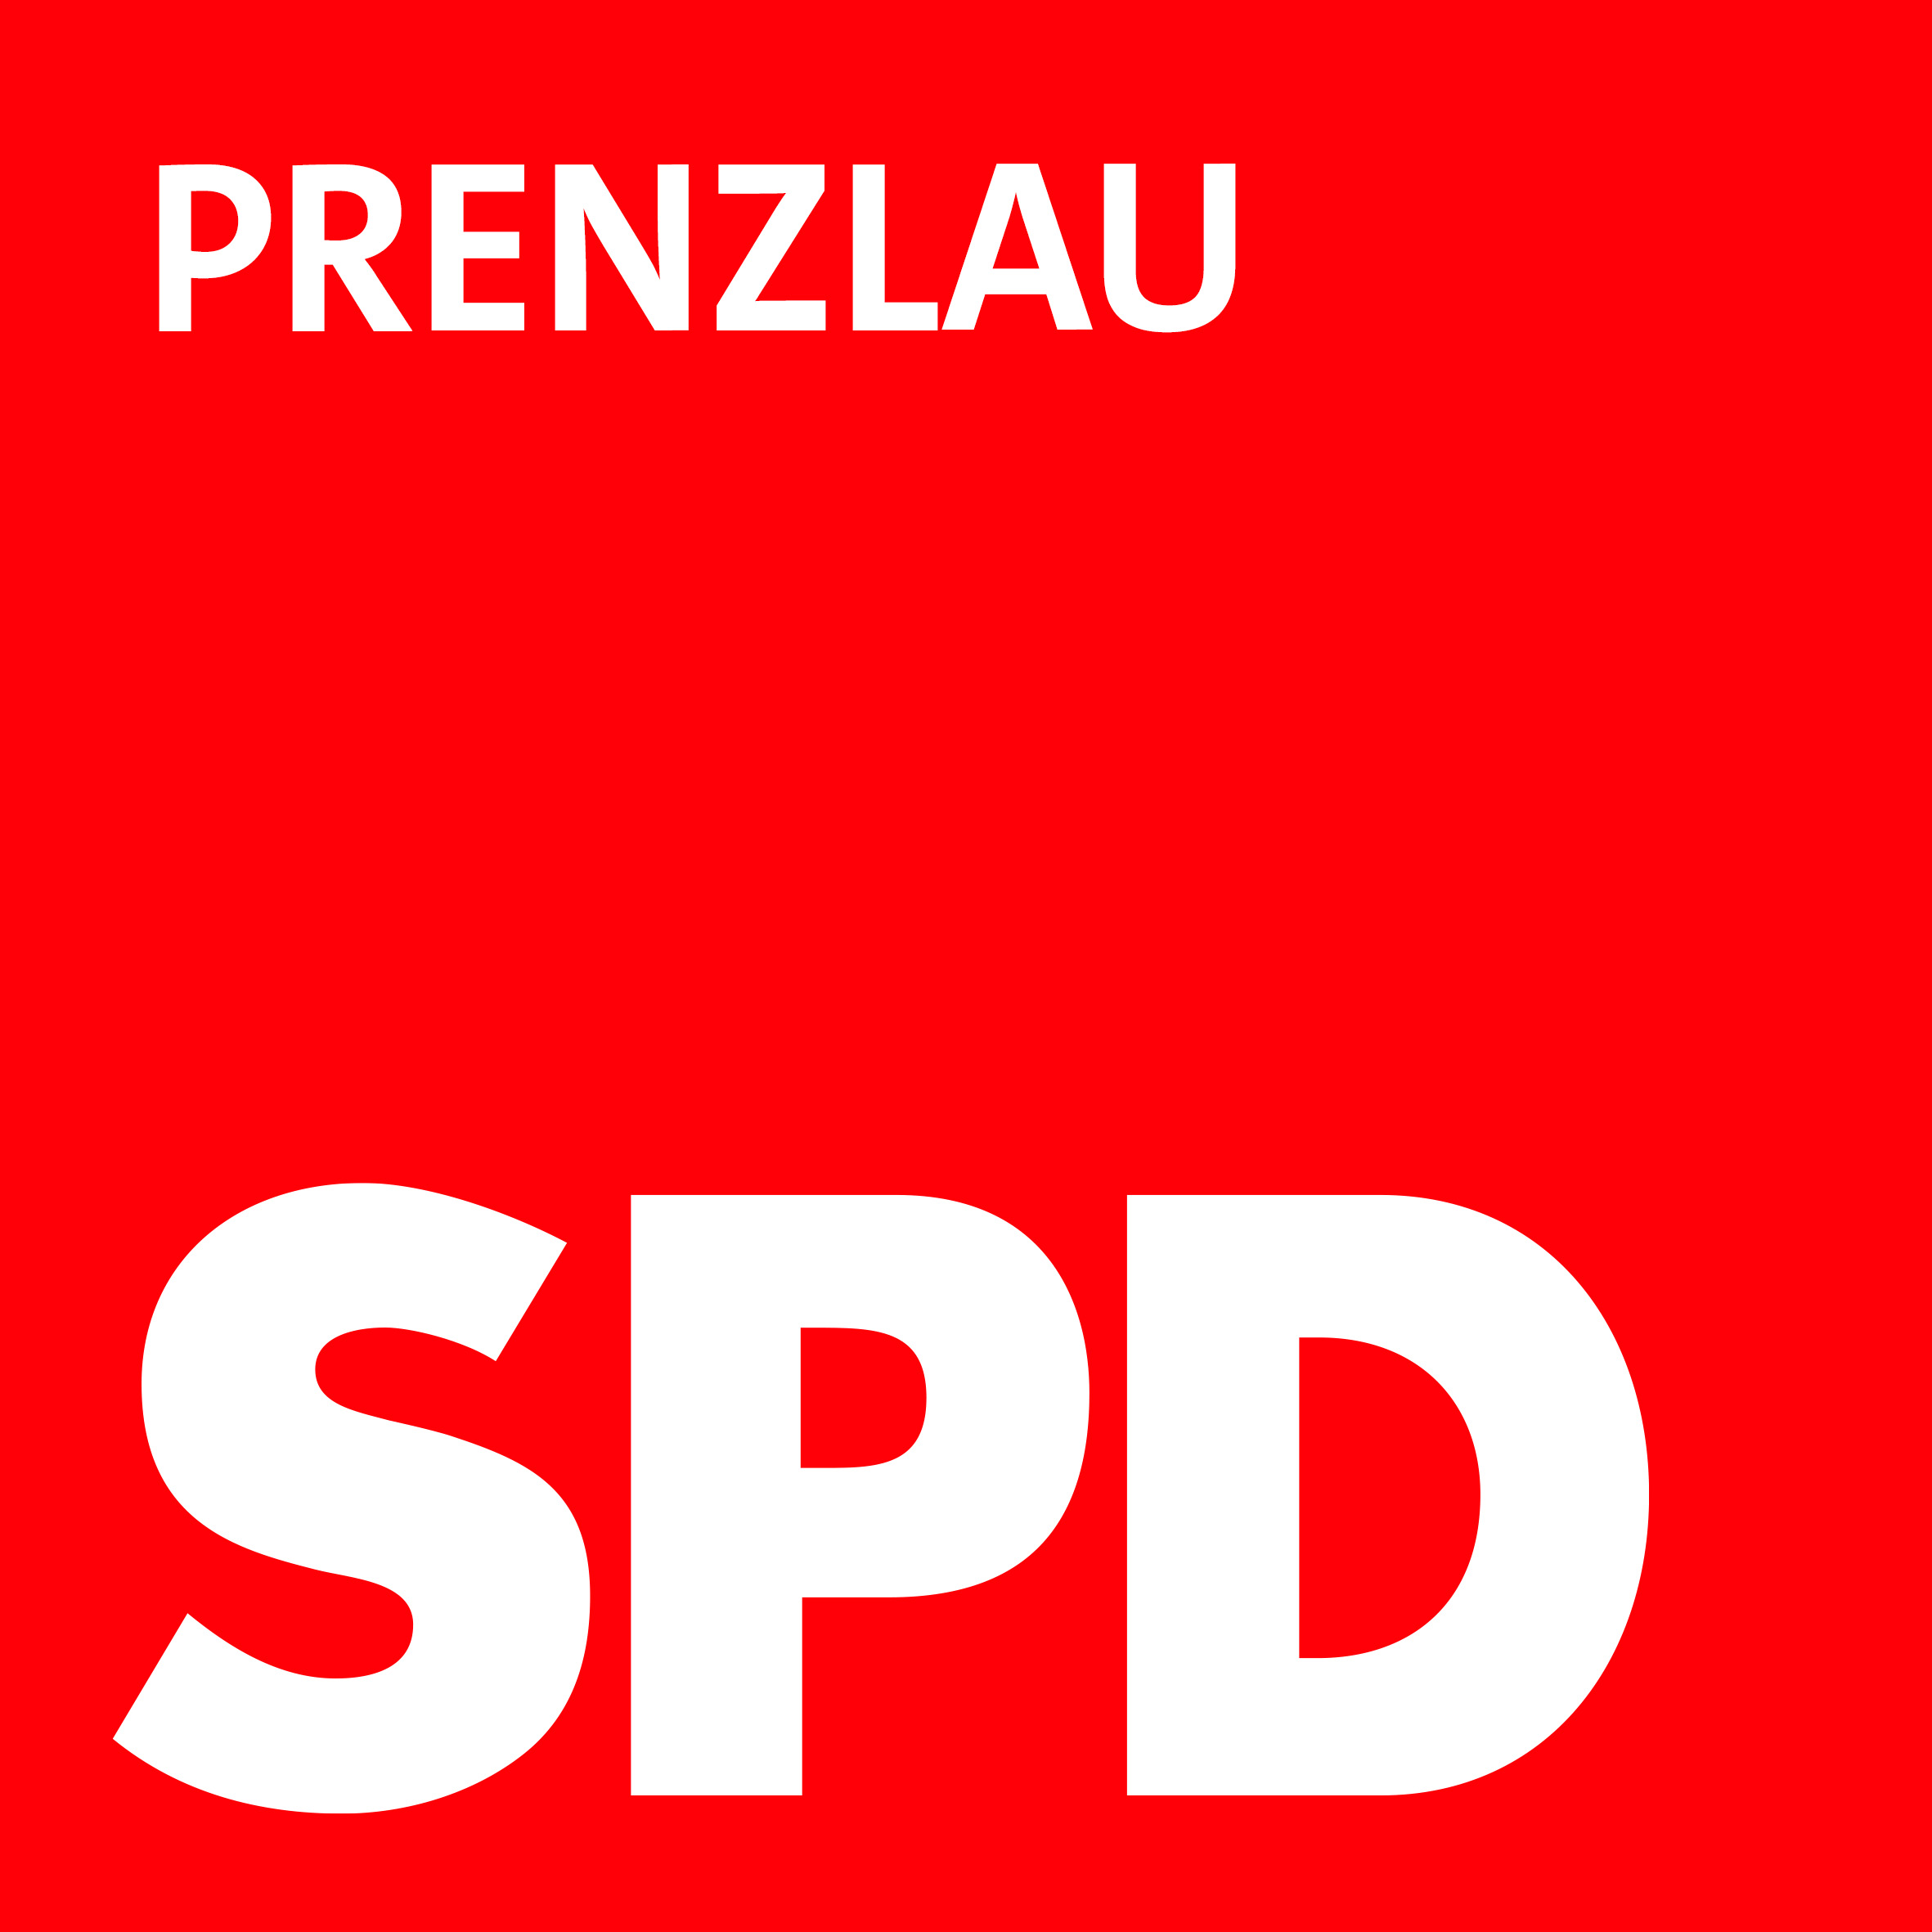 SPD Prenzlau